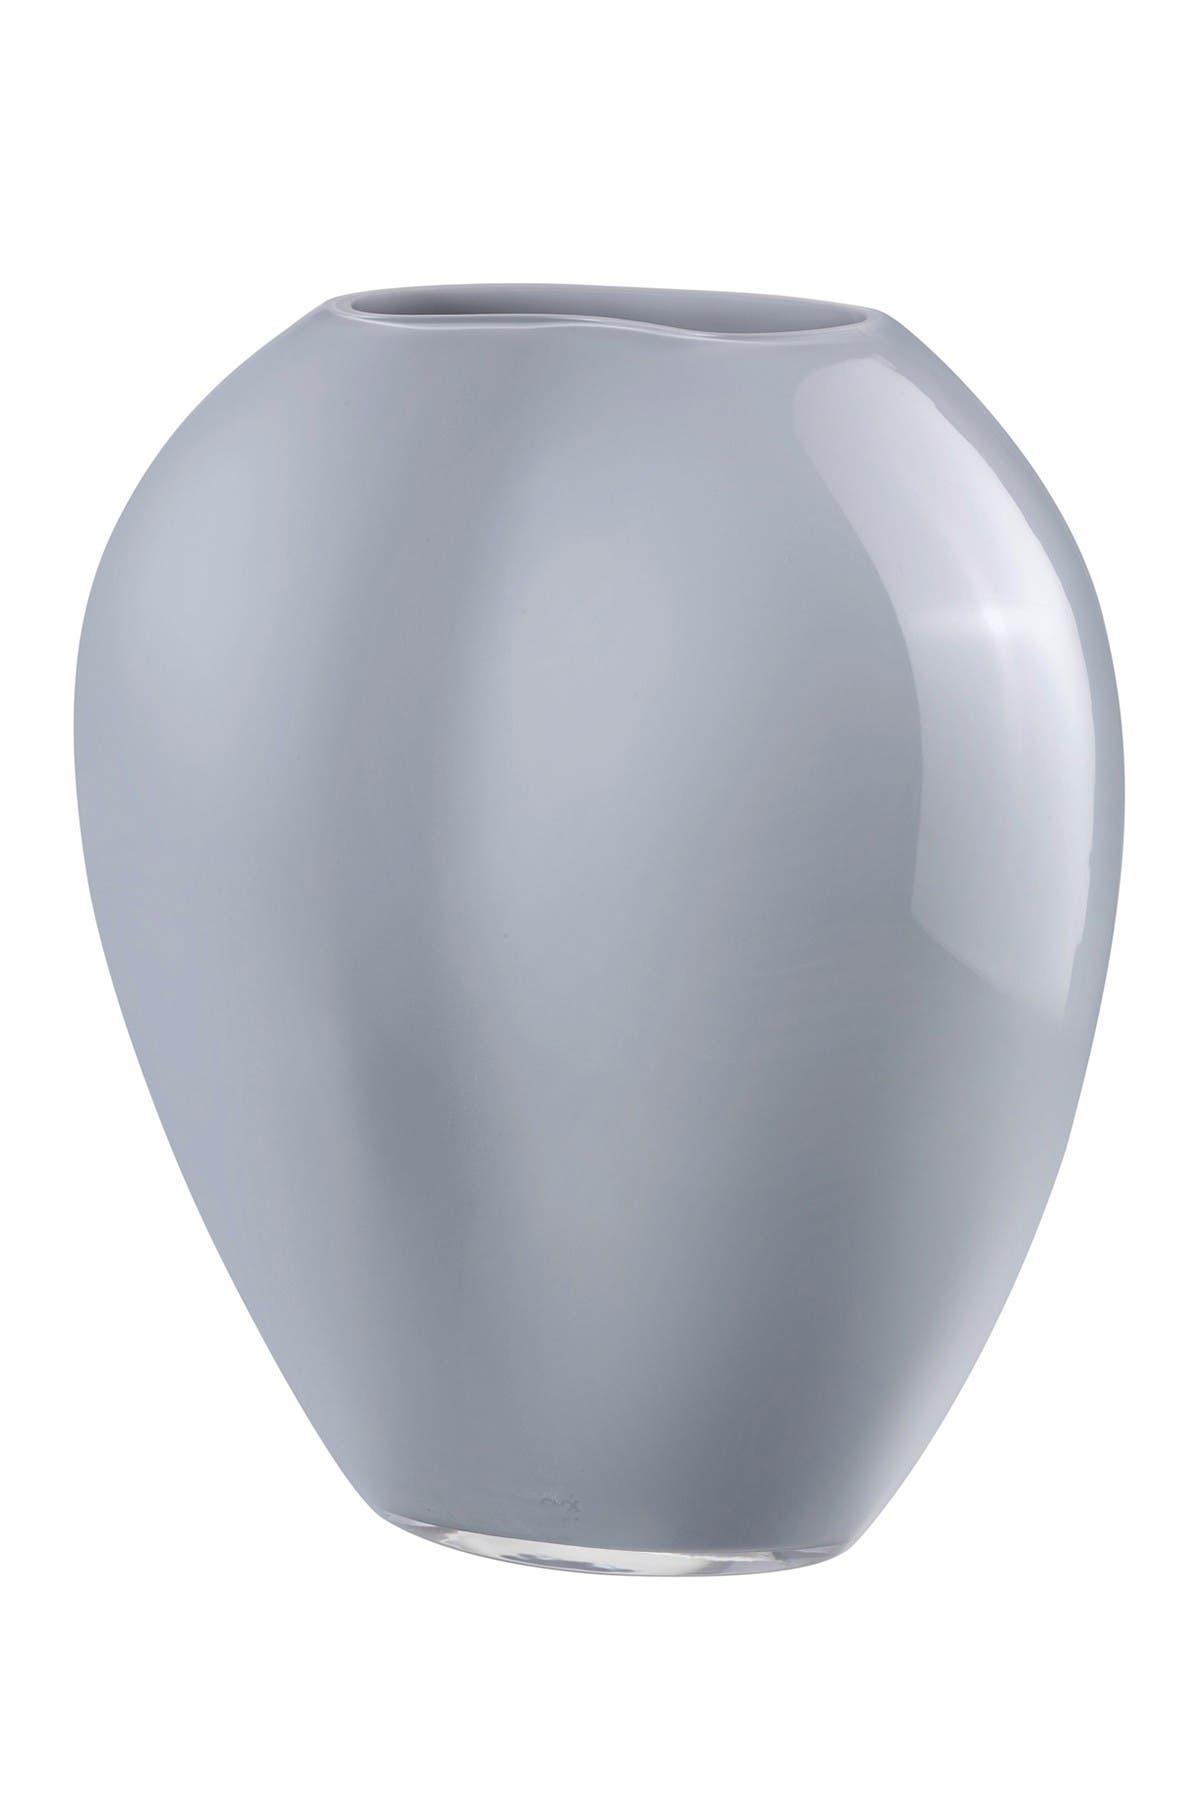 Image of Nude Glass Satin Vase - Large - Opal Grey